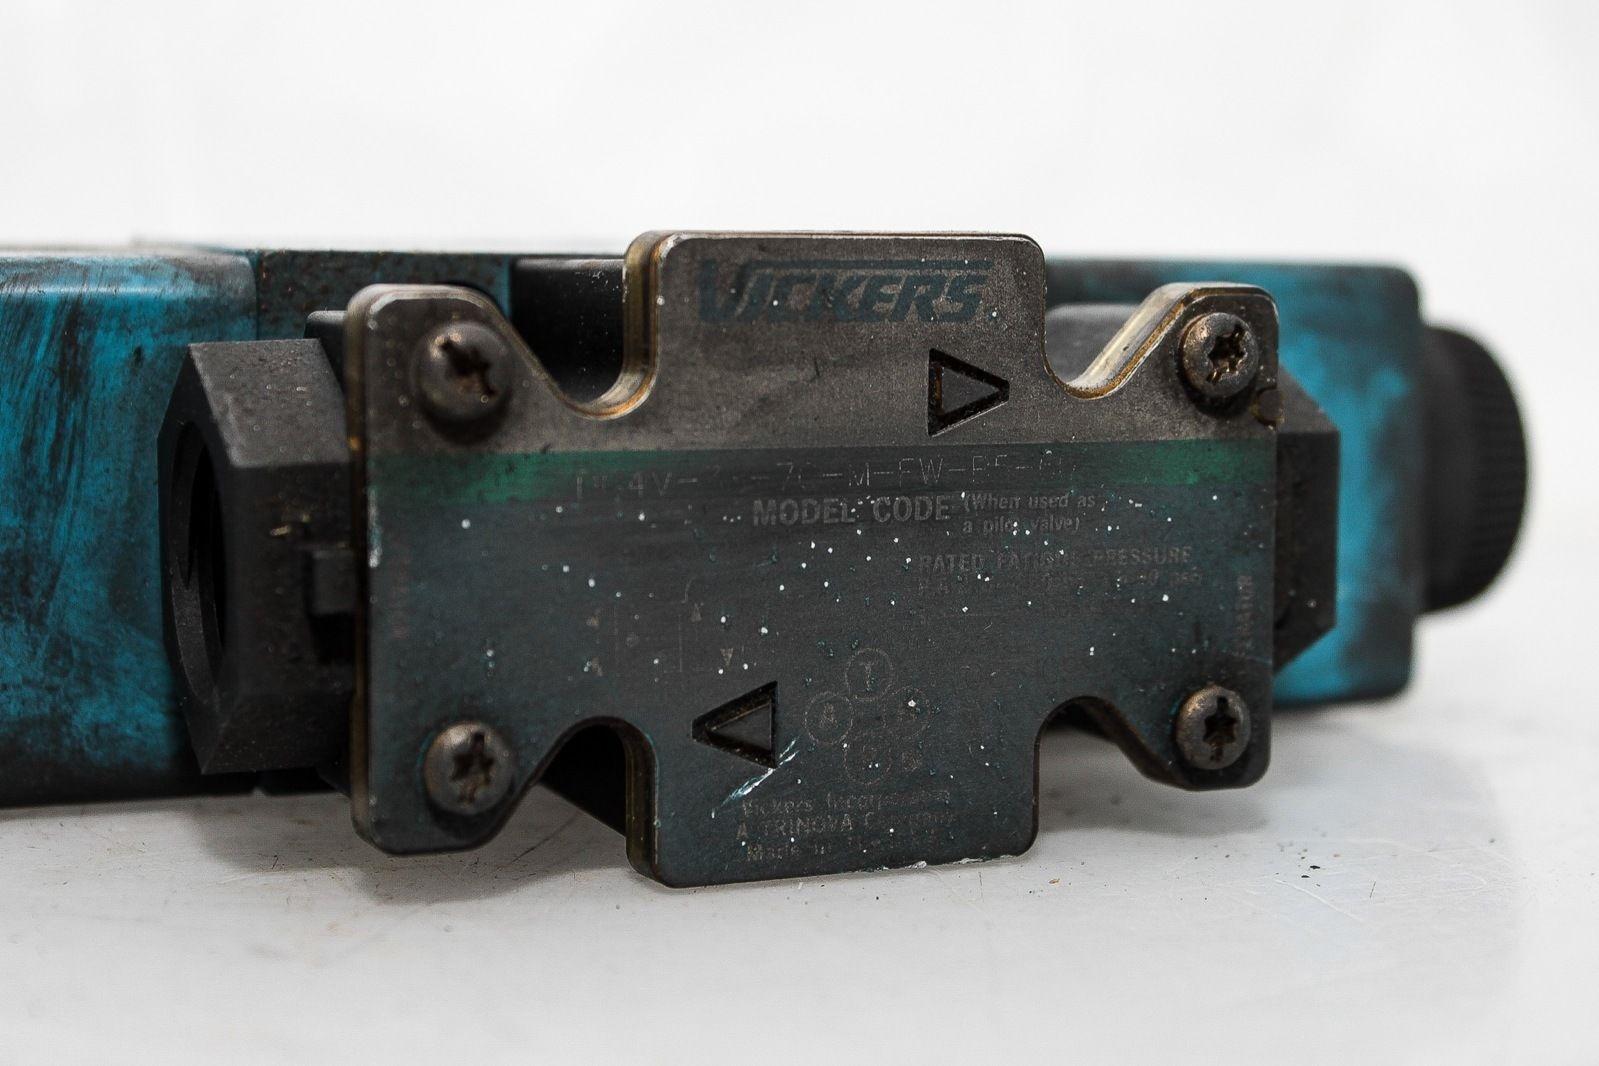 VICKERS DG4V-3S-7C-M-FW-B5-60 REVERSABLE HYDRAULIC CONTROL SOLENOID VALVE! (F9) 2